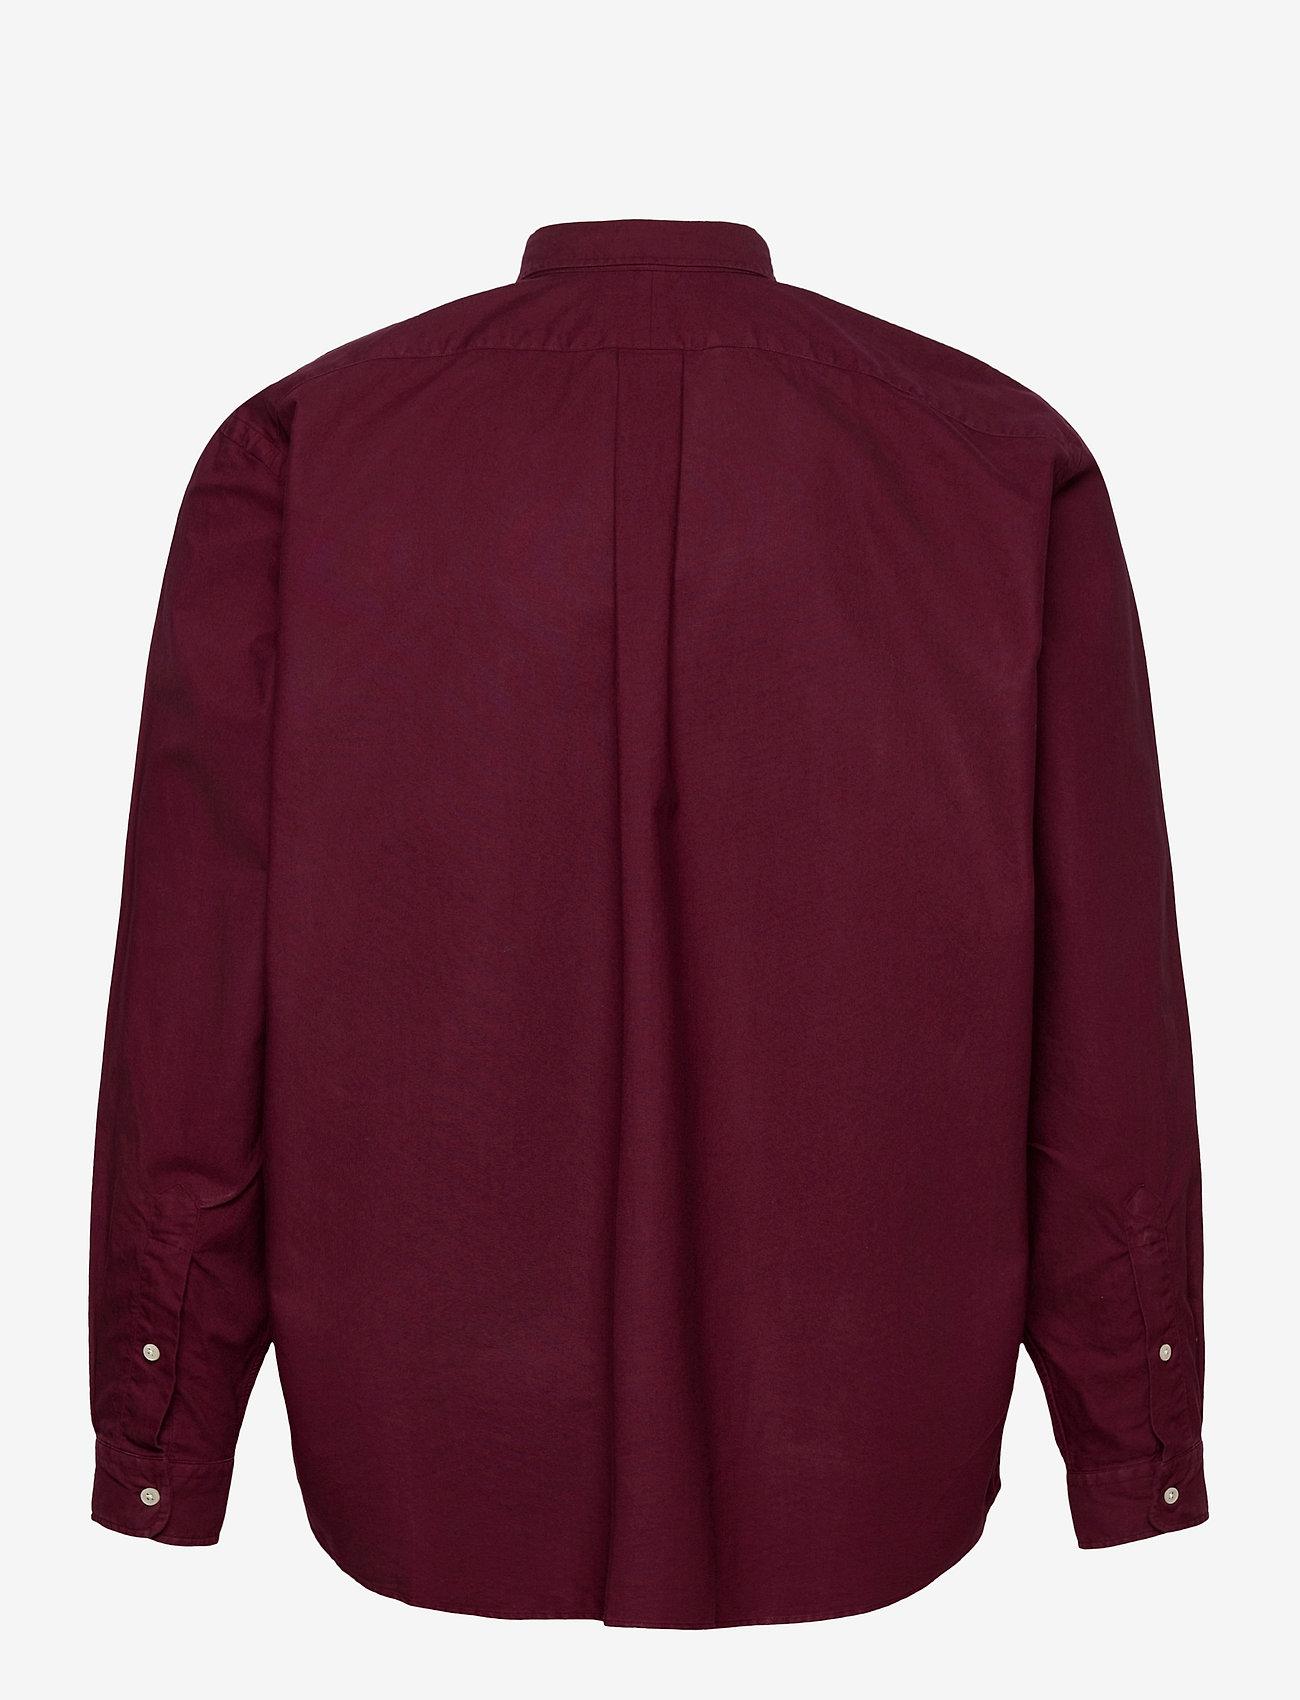 Polo Ralph Lauren Big & Tall - Garment-Dyed Oxford Shirt - casual shirts - classic wine - 1